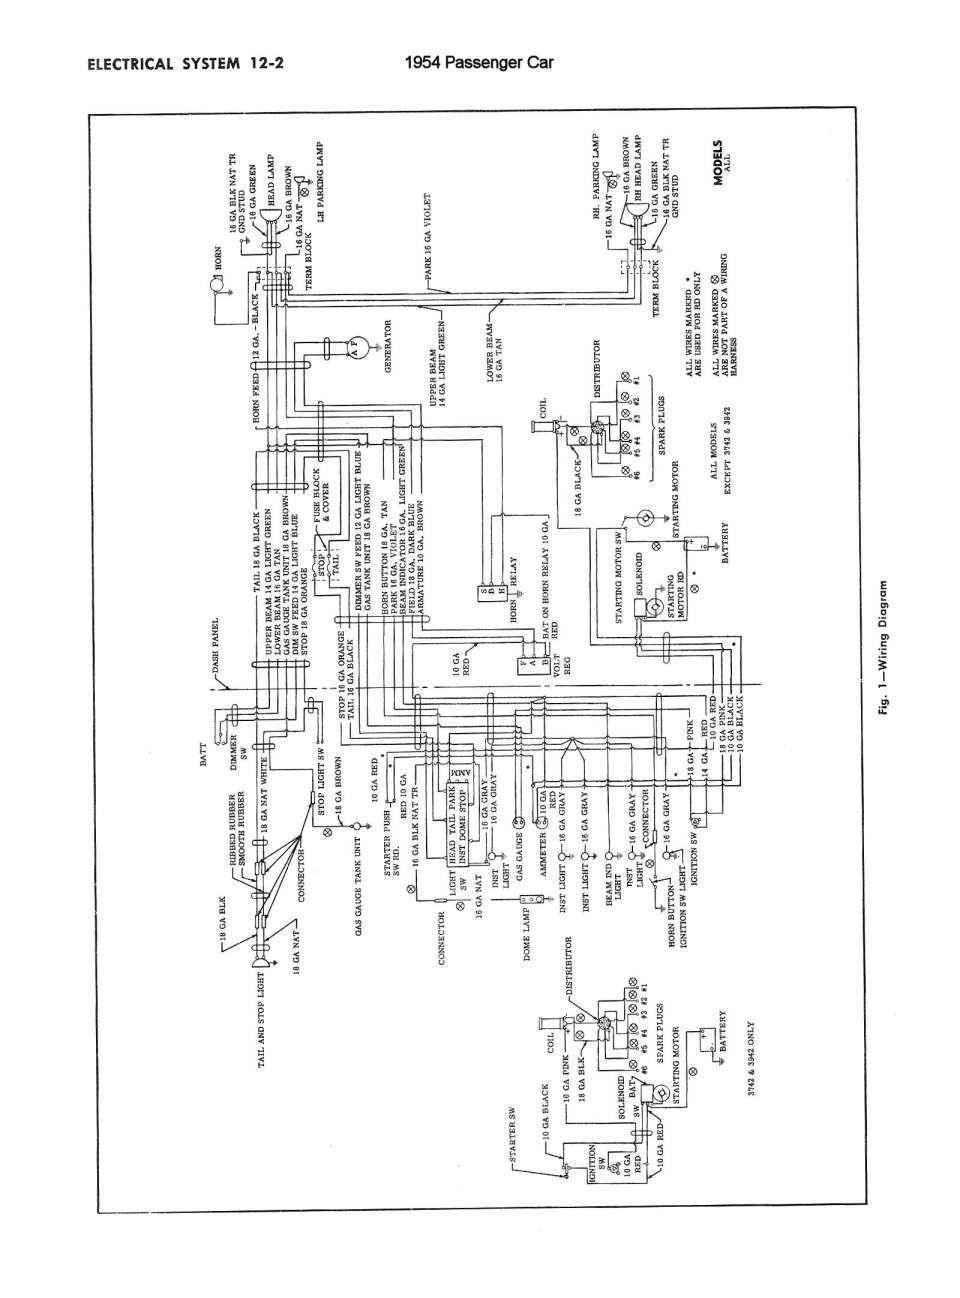 17 Gauges Wiring Diagram 1950 Chevy Car Car Diagram Wiringg Net Diagram Electrical Wiring Diagram Headlights